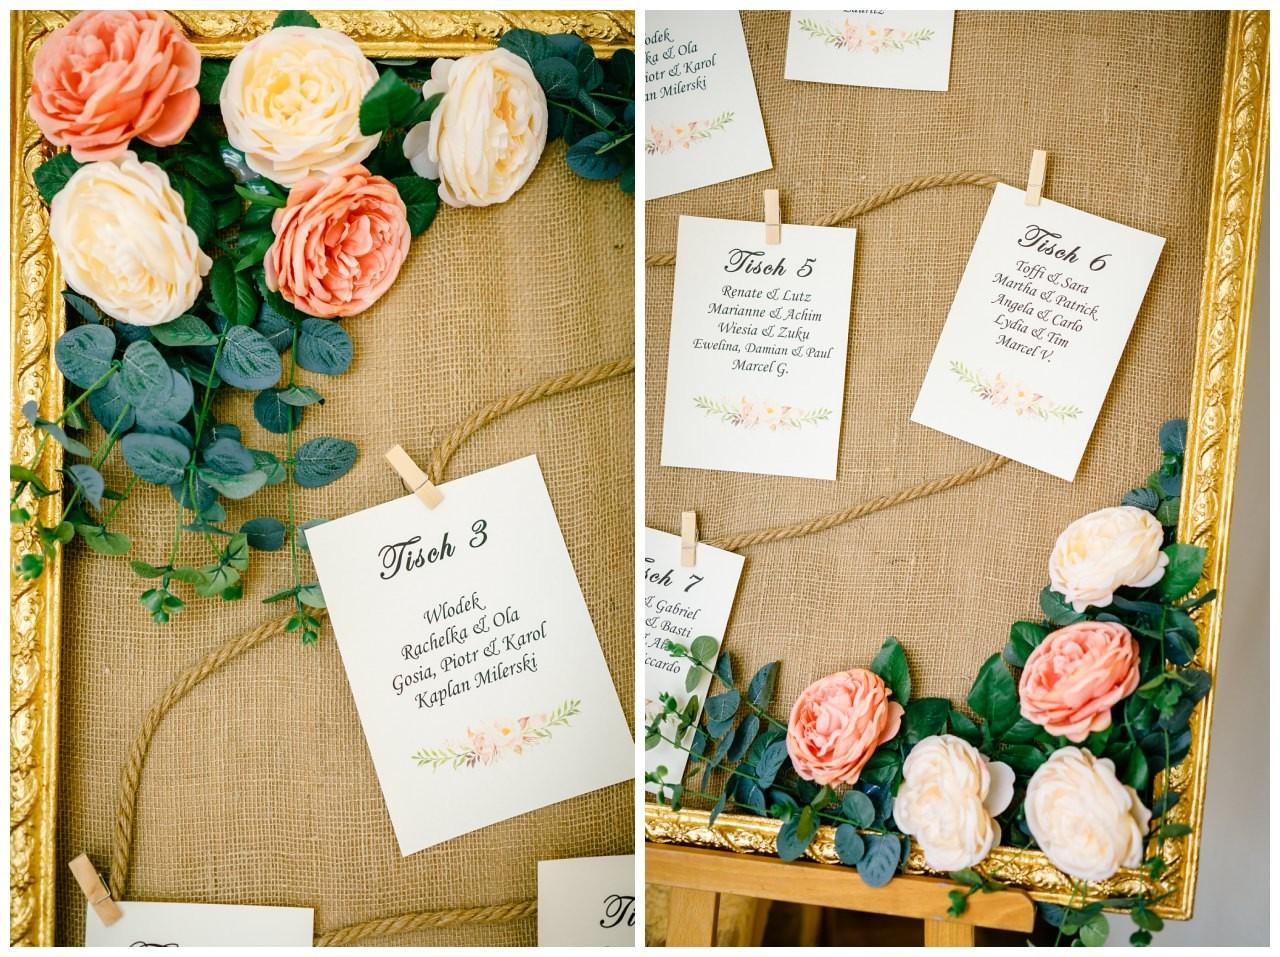 Hochzeit am See Seepavillion Fühlinger Köln Hochzeitsfotograf Hochzeitsfotos 61 - Hochzeit am Seepavillon Fühlinger See in Köln